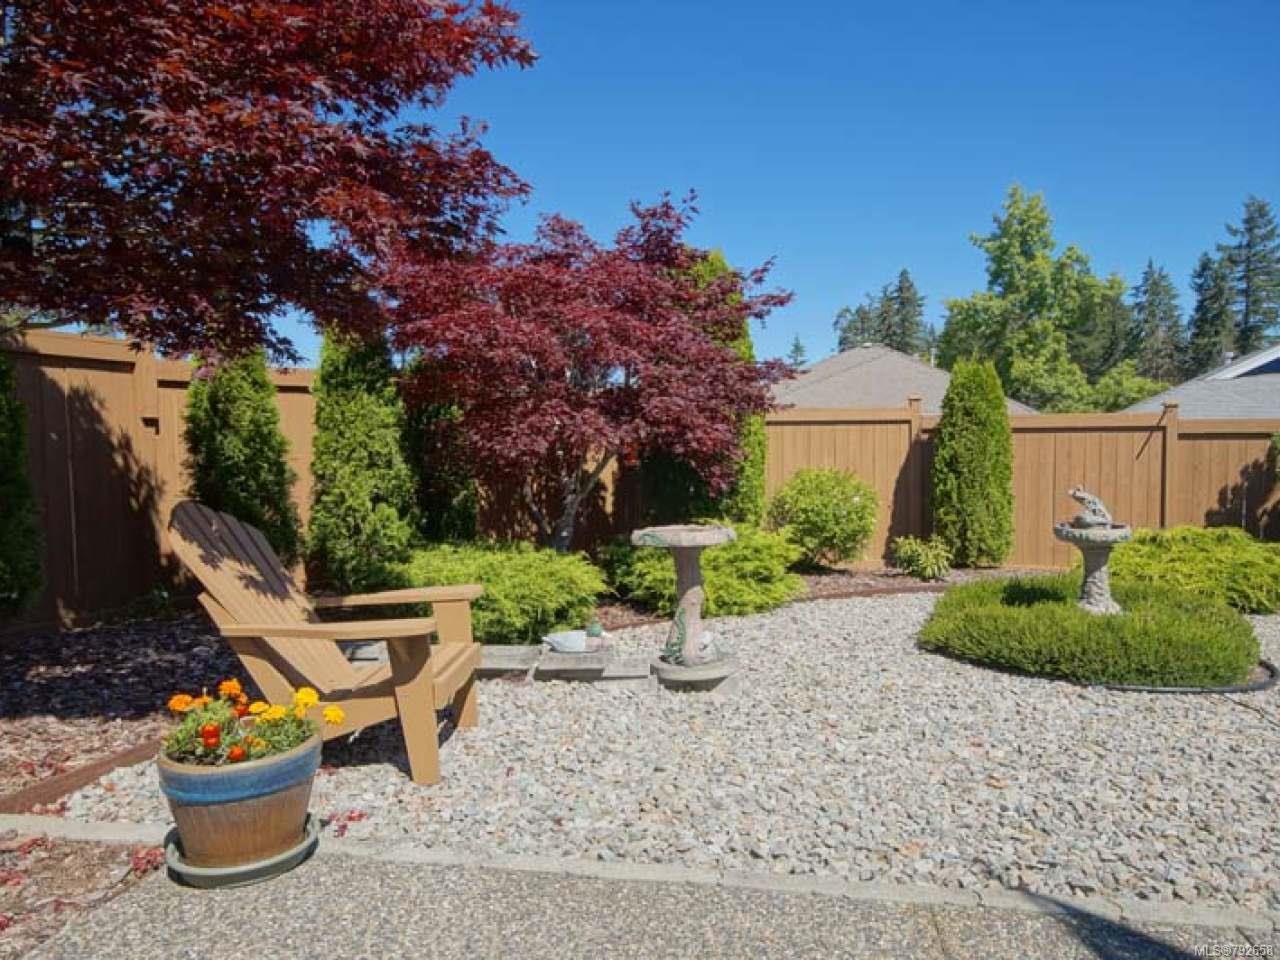 Photo 19: Photos: 893 EDGEWARE Avenue in PARKSVILLE: PQ Parksville House for sale (Parksville/Qualicum)  : MLS®# 792658